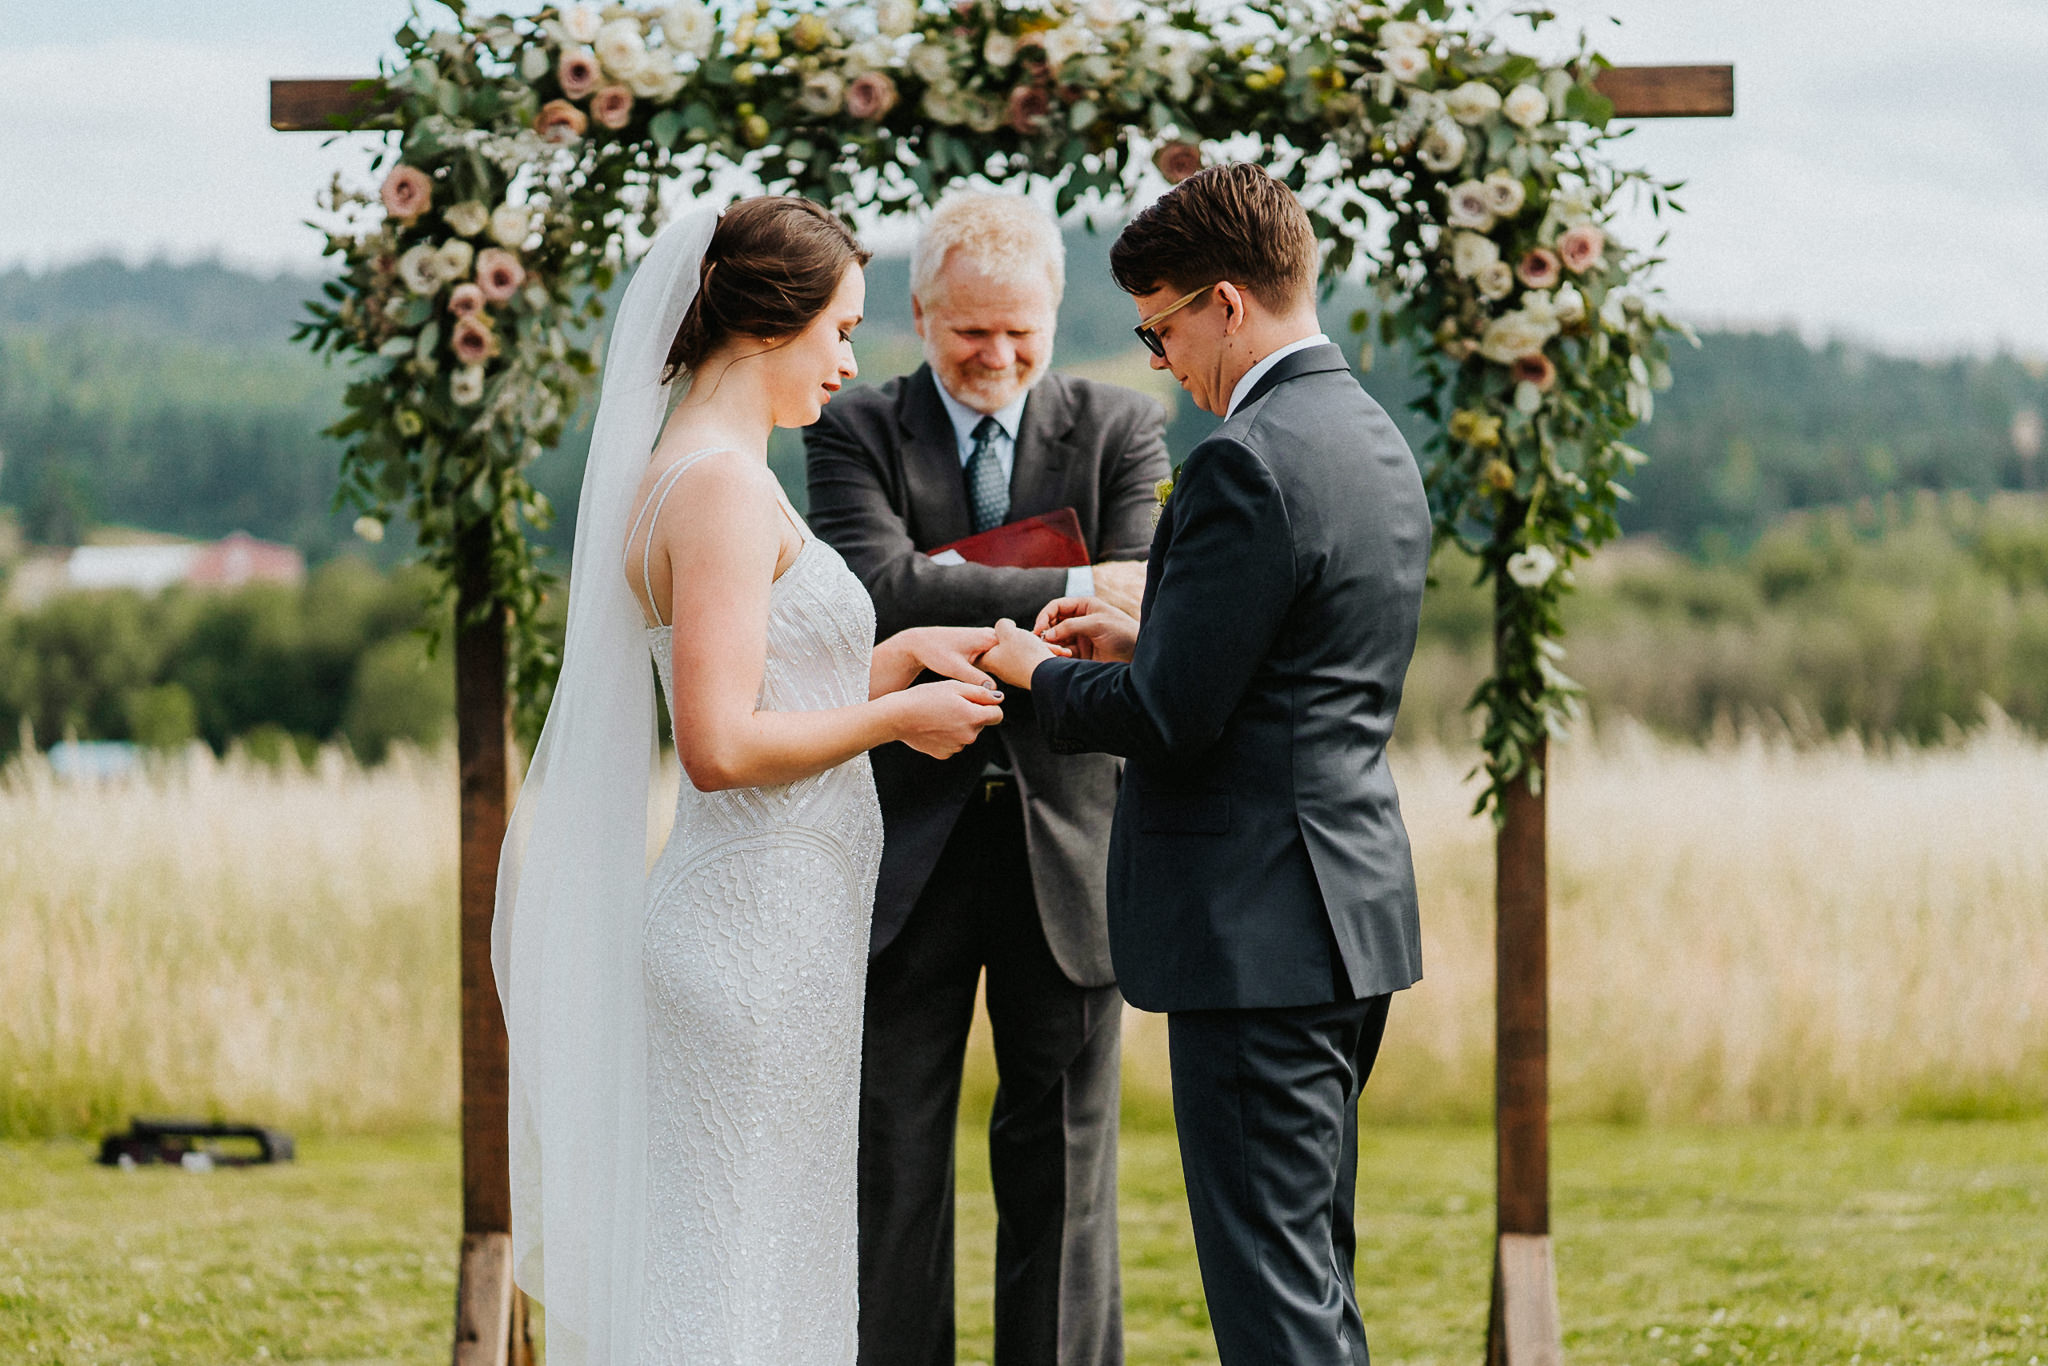 Exchange ring shot Bride Groom nervous